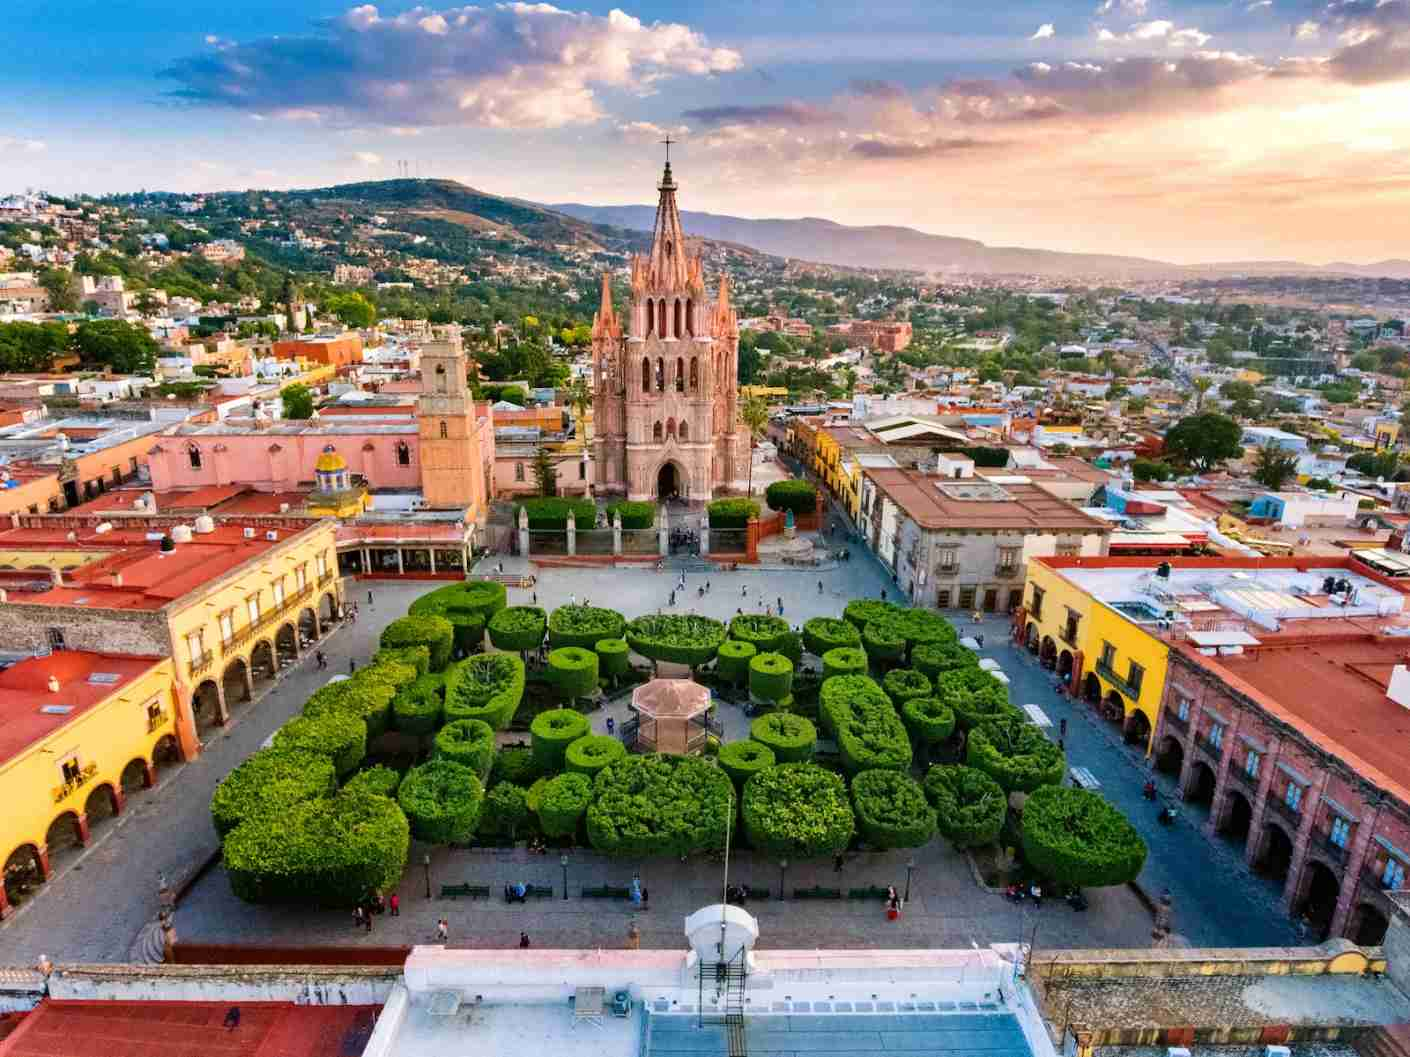 (San Miguel de Allende in Mexico. Photo by ferrantraite/Getty Images)